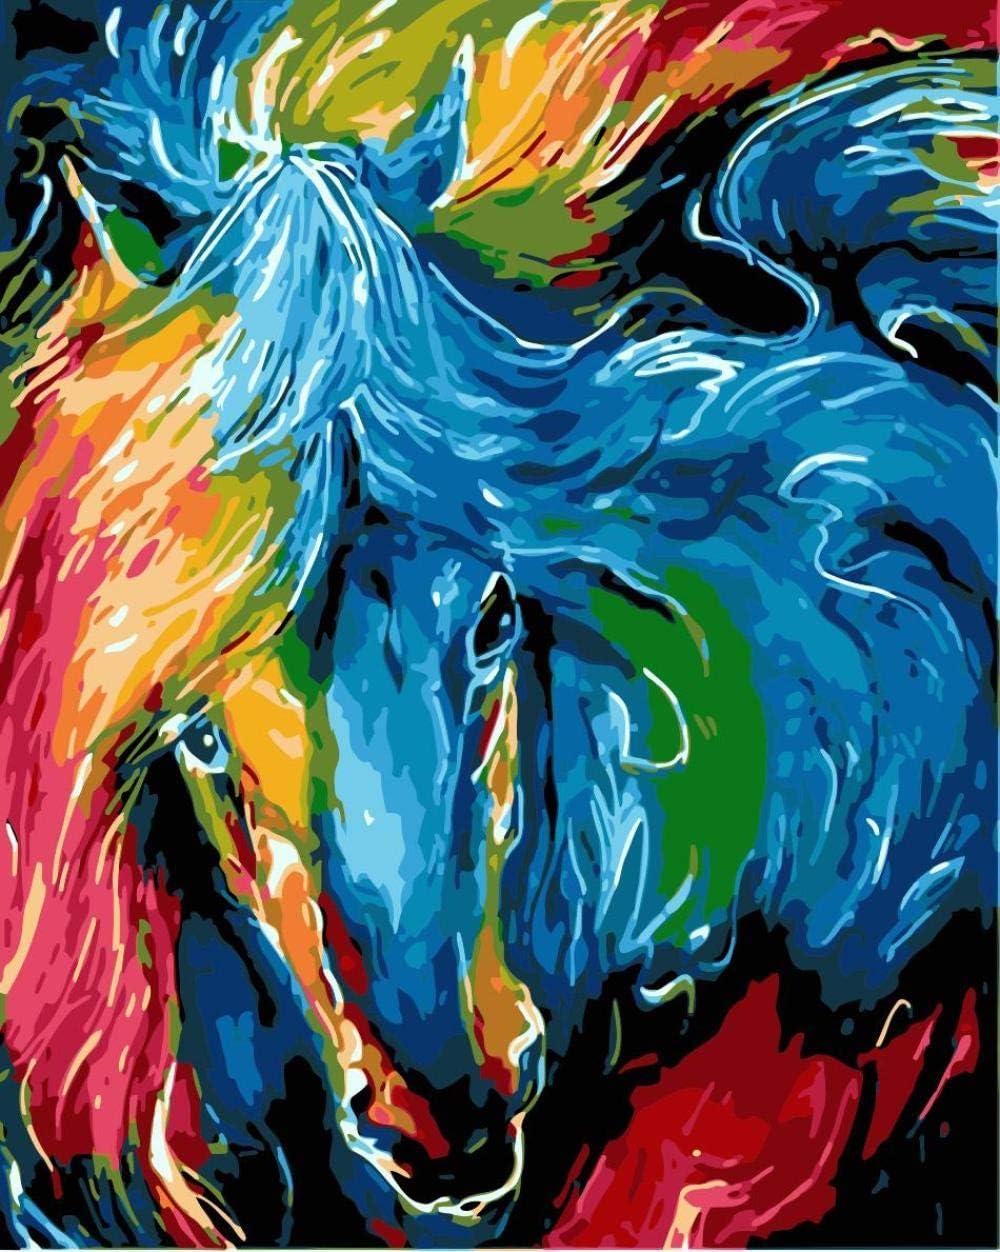 Zhonchng Digital Bricolaje Cabeza De Caballo De Color Pintura Al Óleo Cuadro Por Números En Decoración De Pared De Arte 40 * 50 Cm-Con Marco